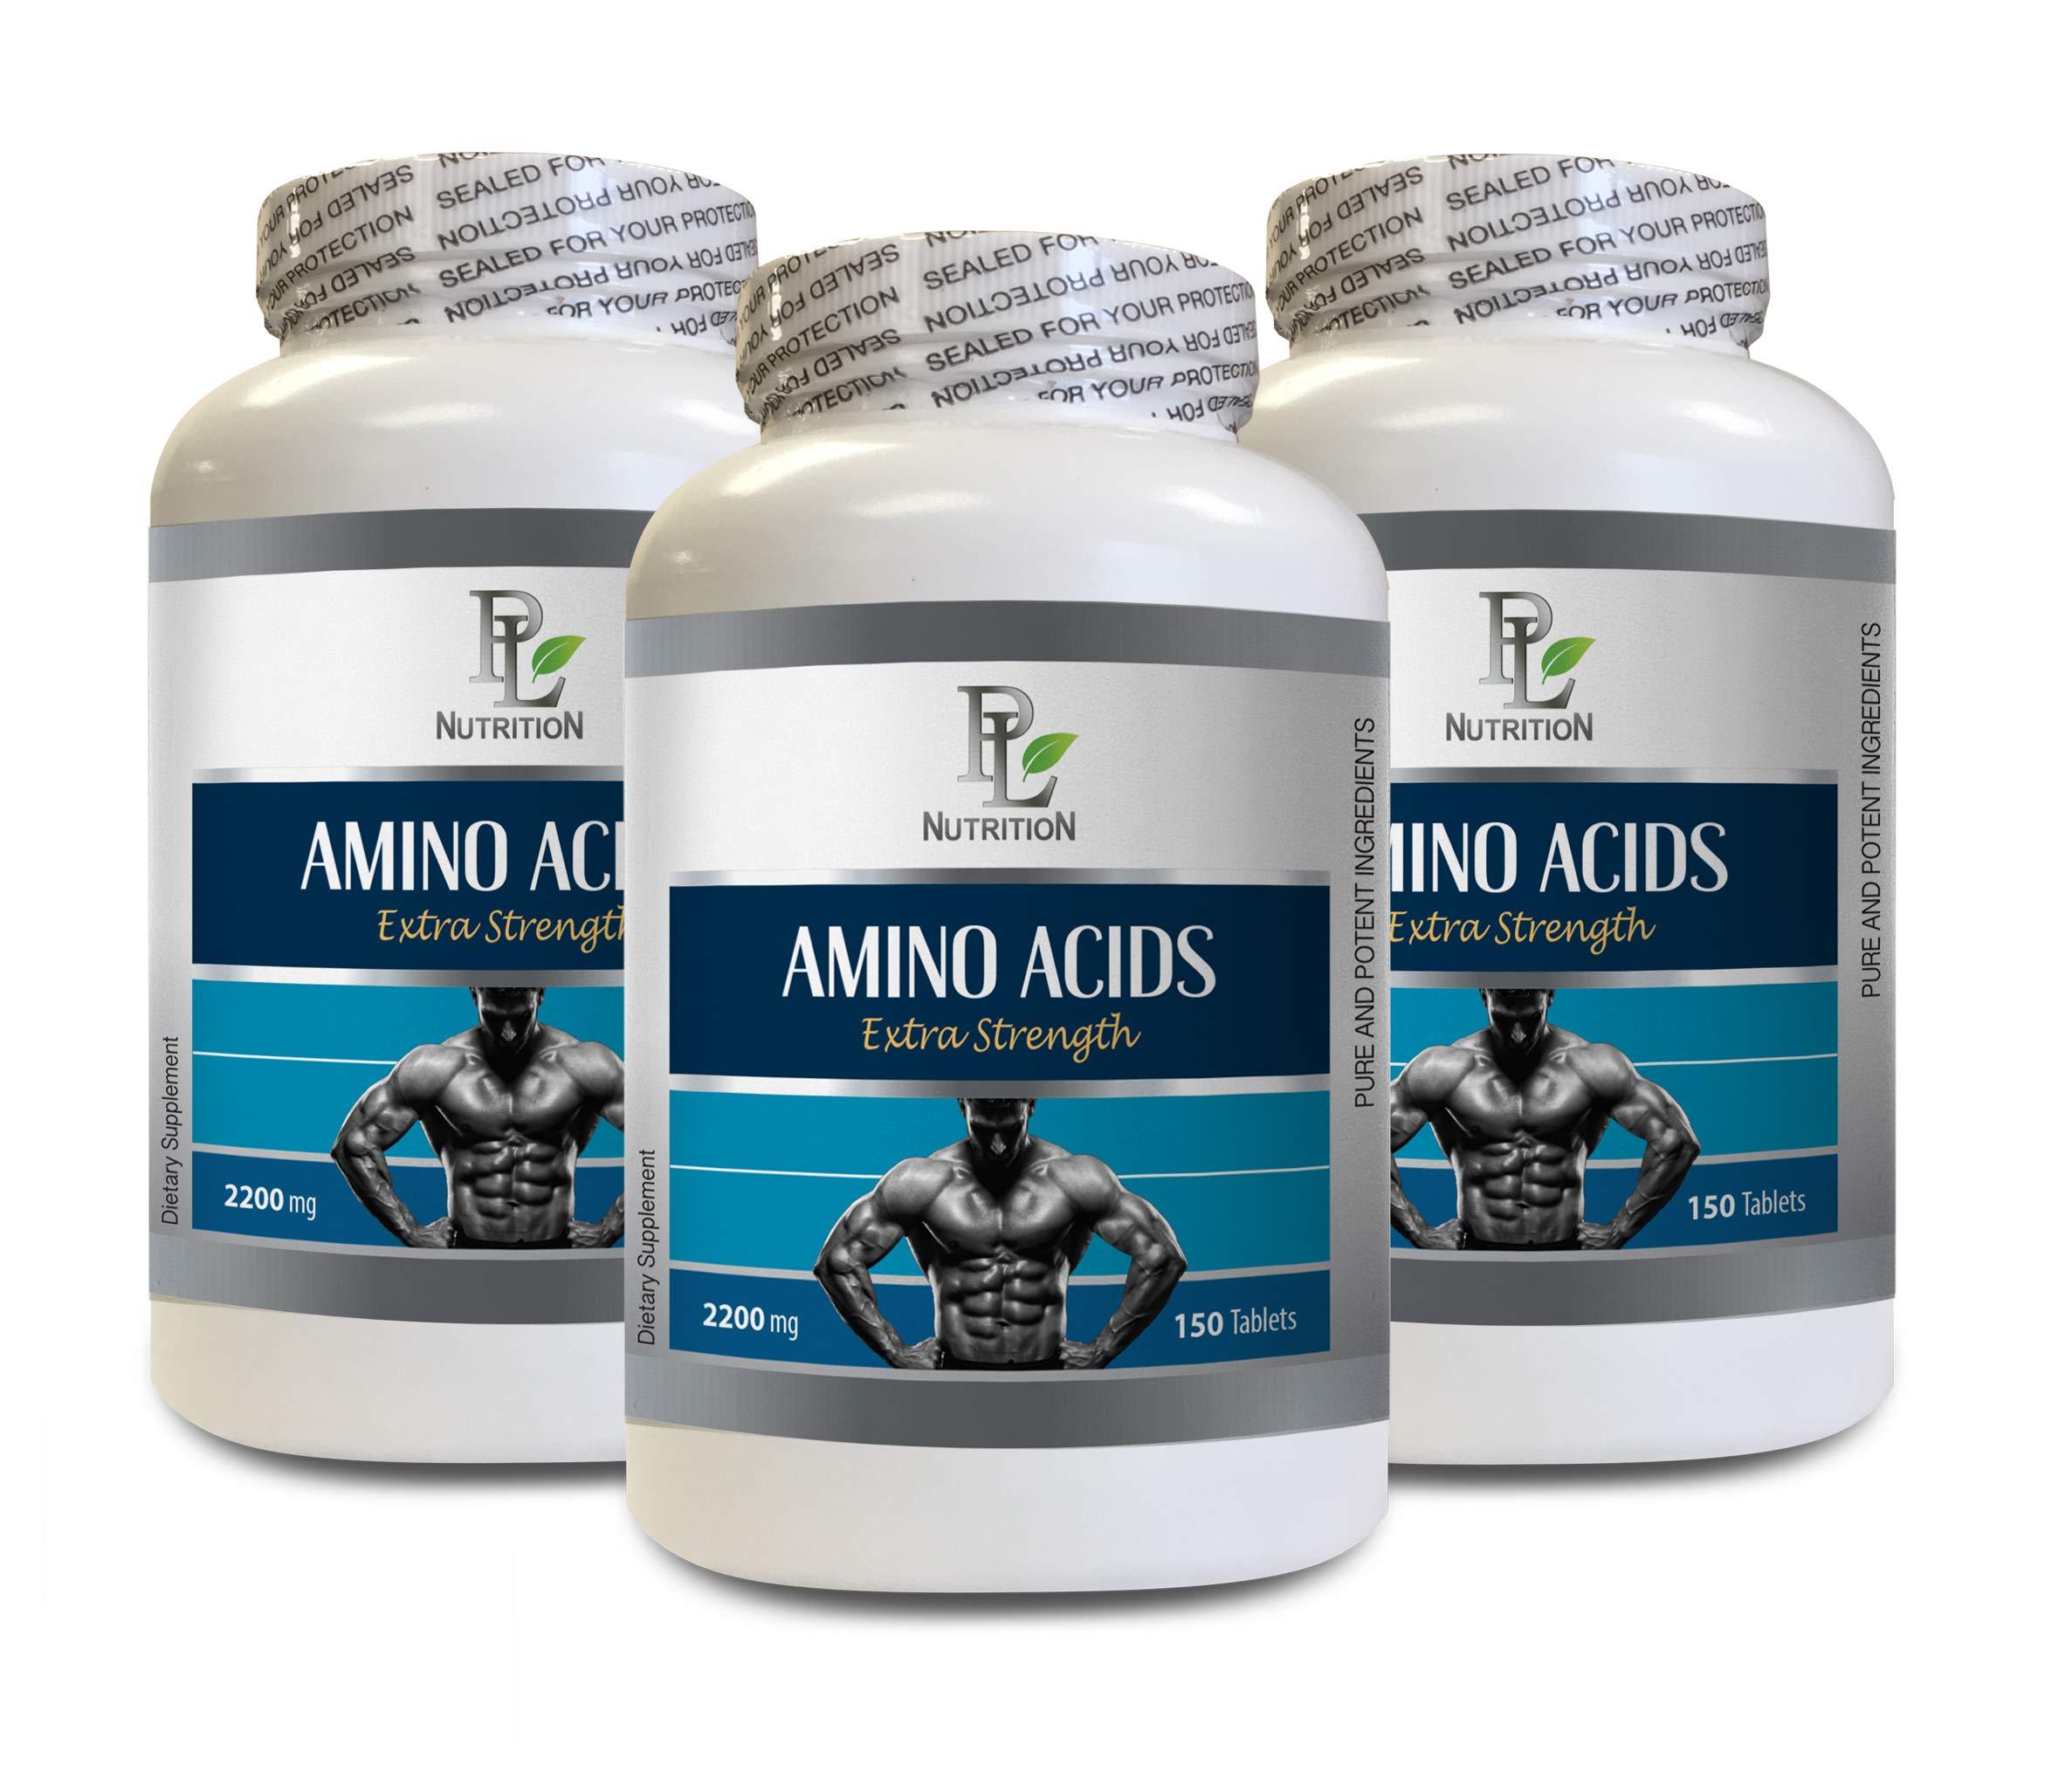 Workout Supplements for Men - Amino ACIDS 2200mg - Extra Strength - l-arginine Nitric Oxide Booster - 3 Bottles 450 Tablets